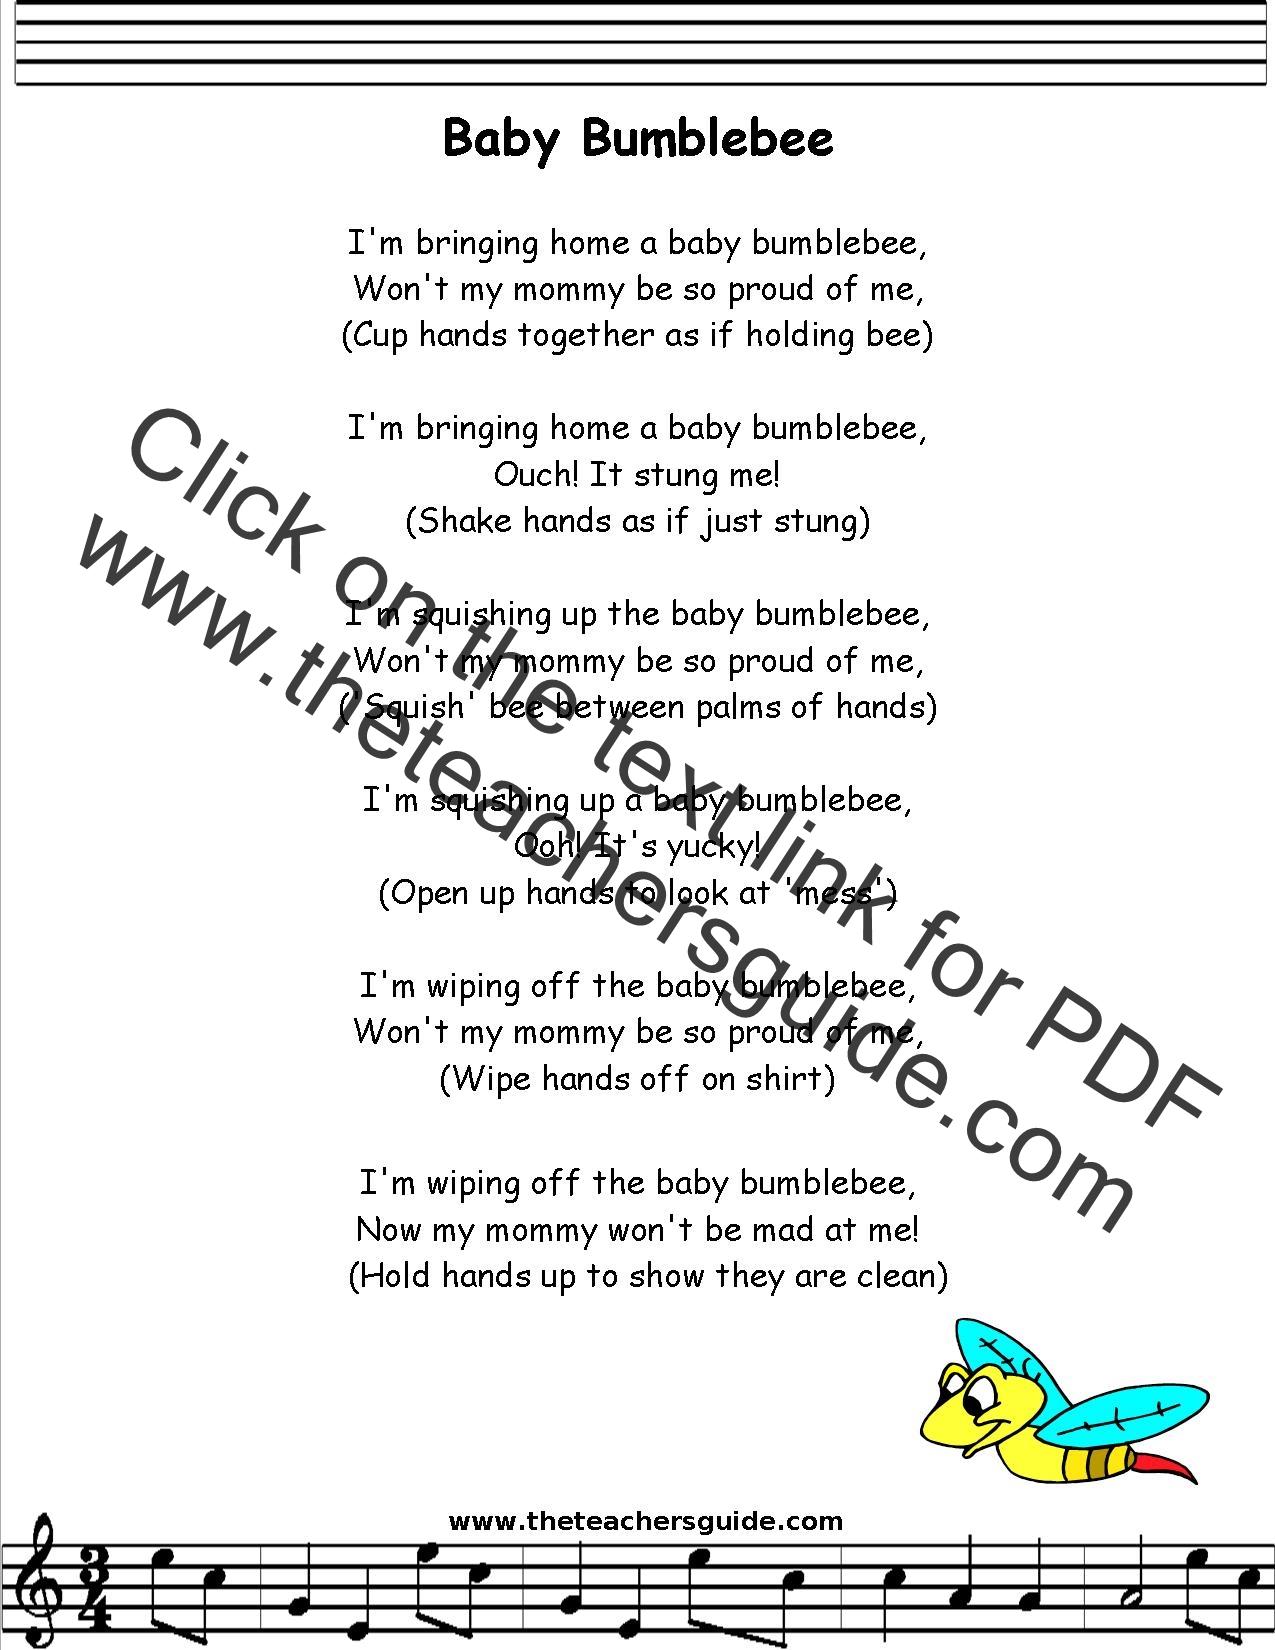 Baby Bumblebee Lyrics Printout Midi And Video